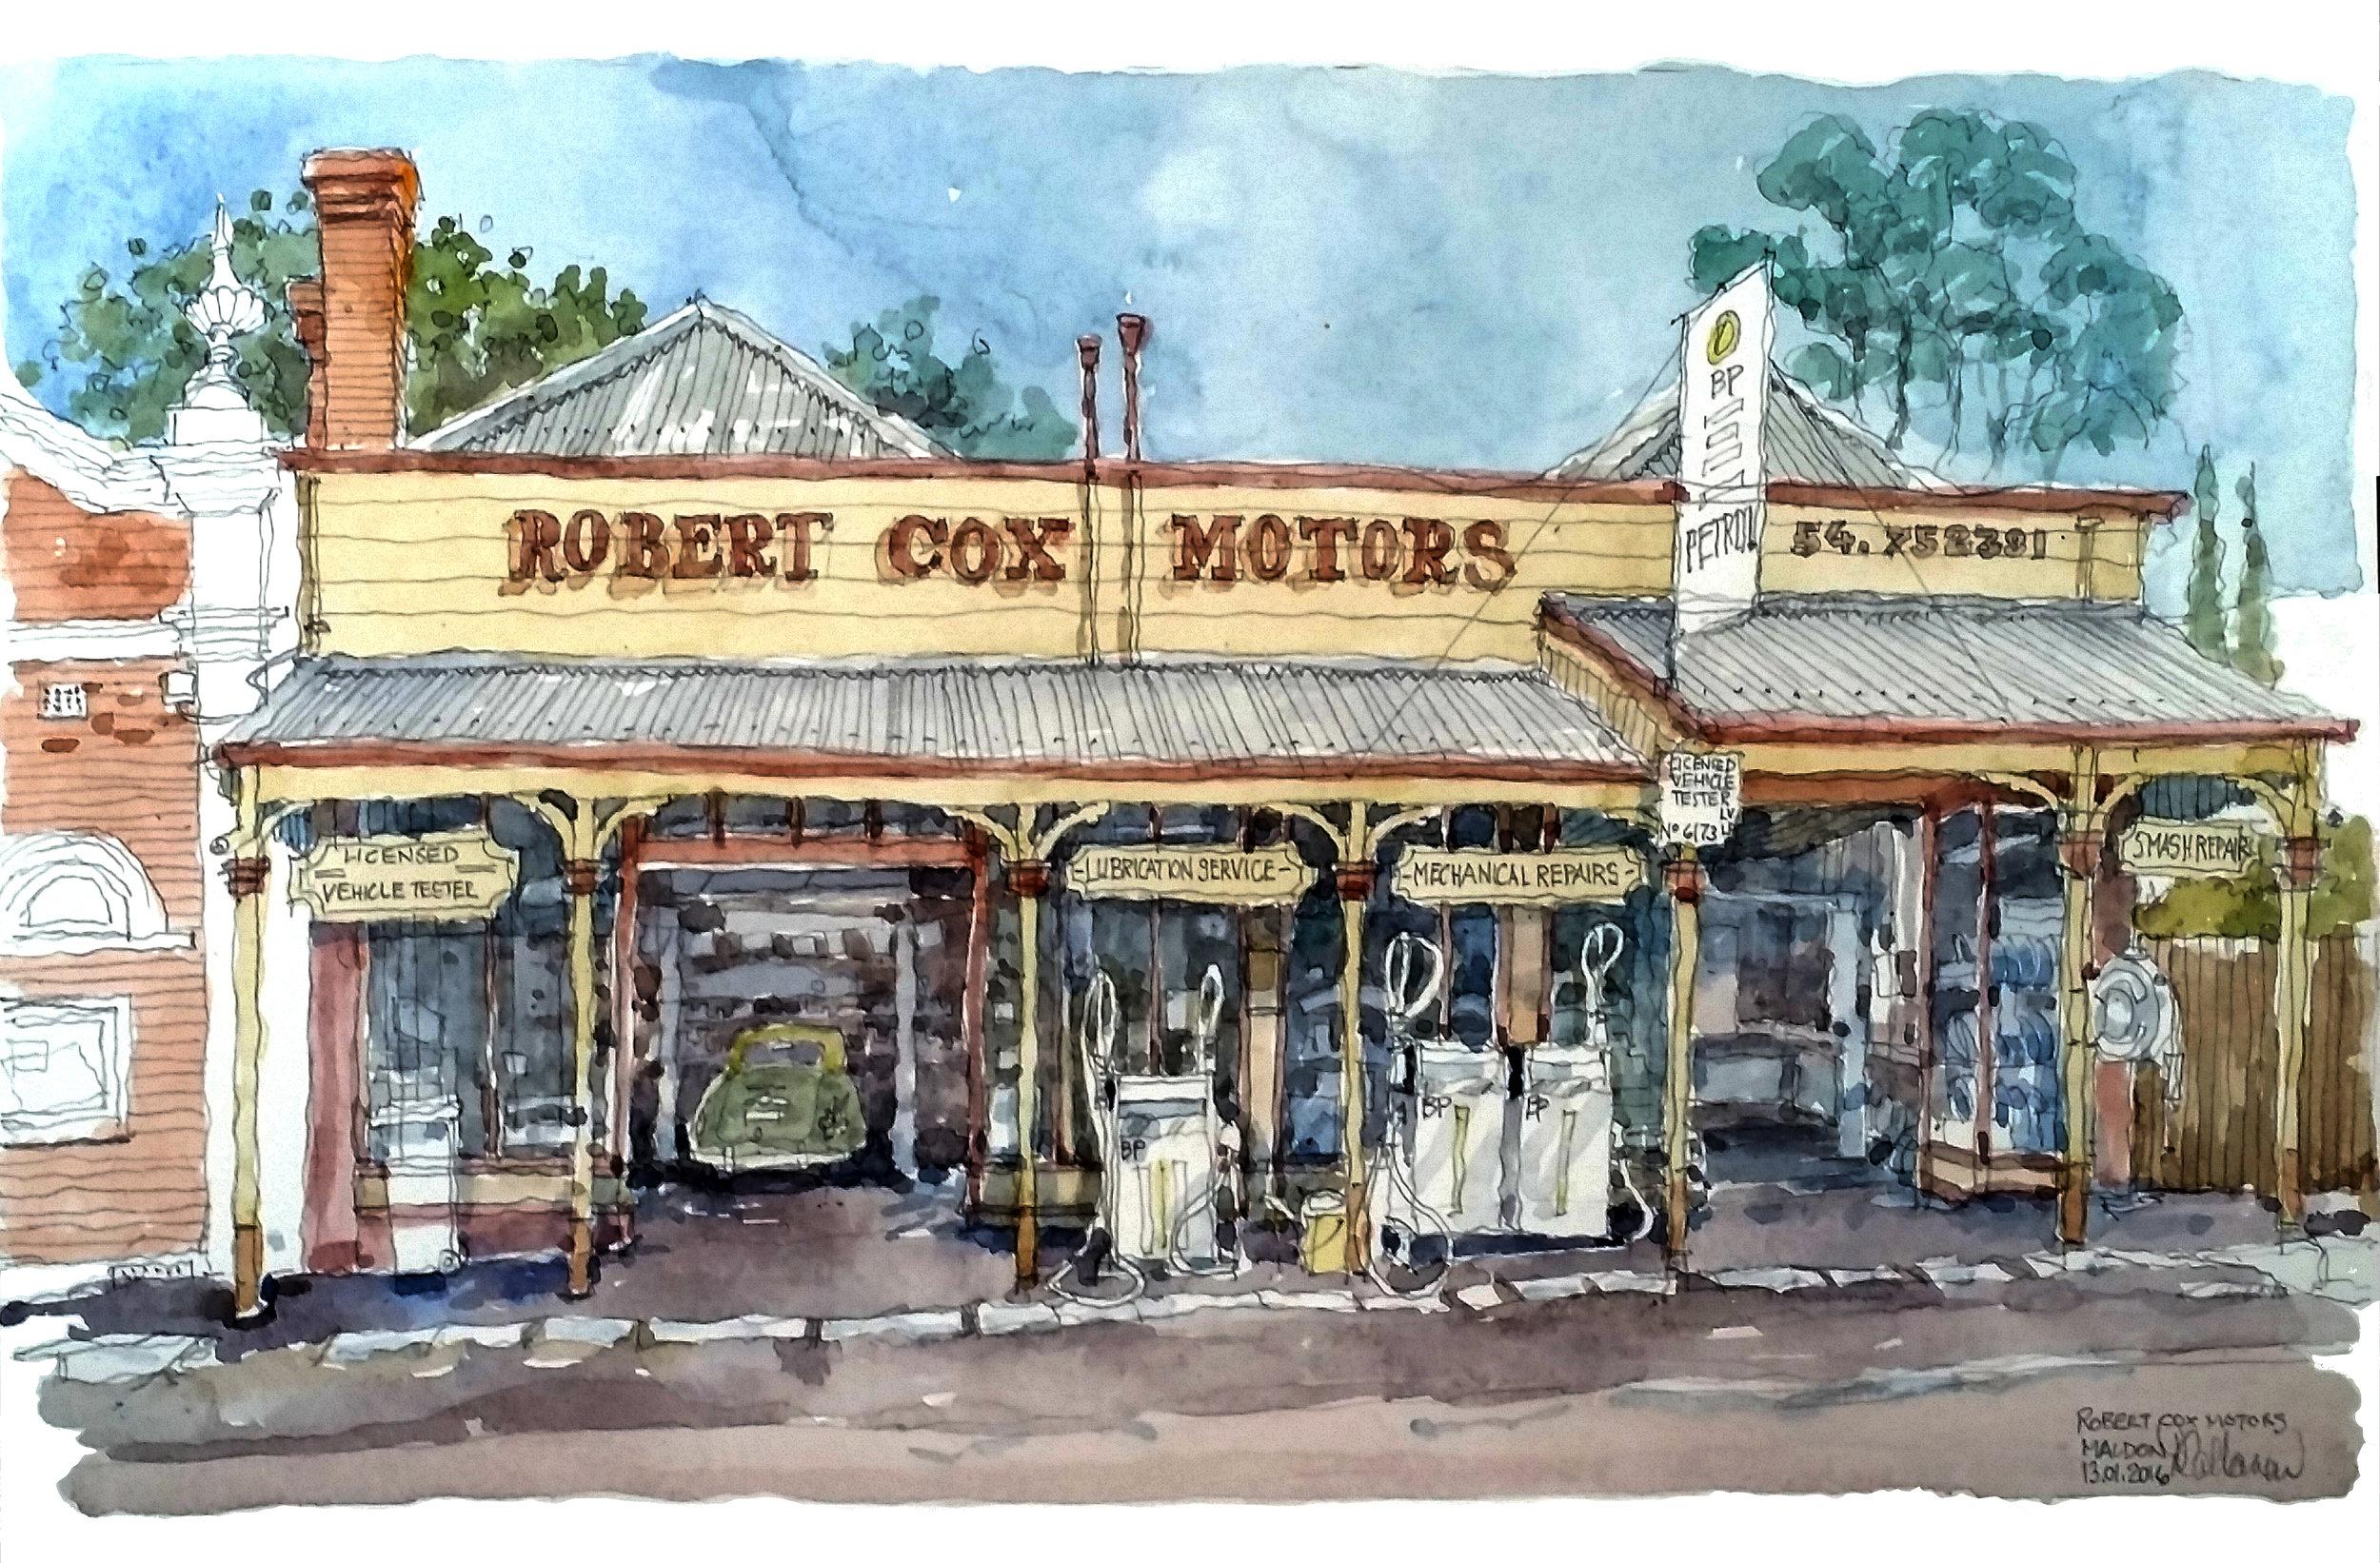 RobertCoxMotors.jpg